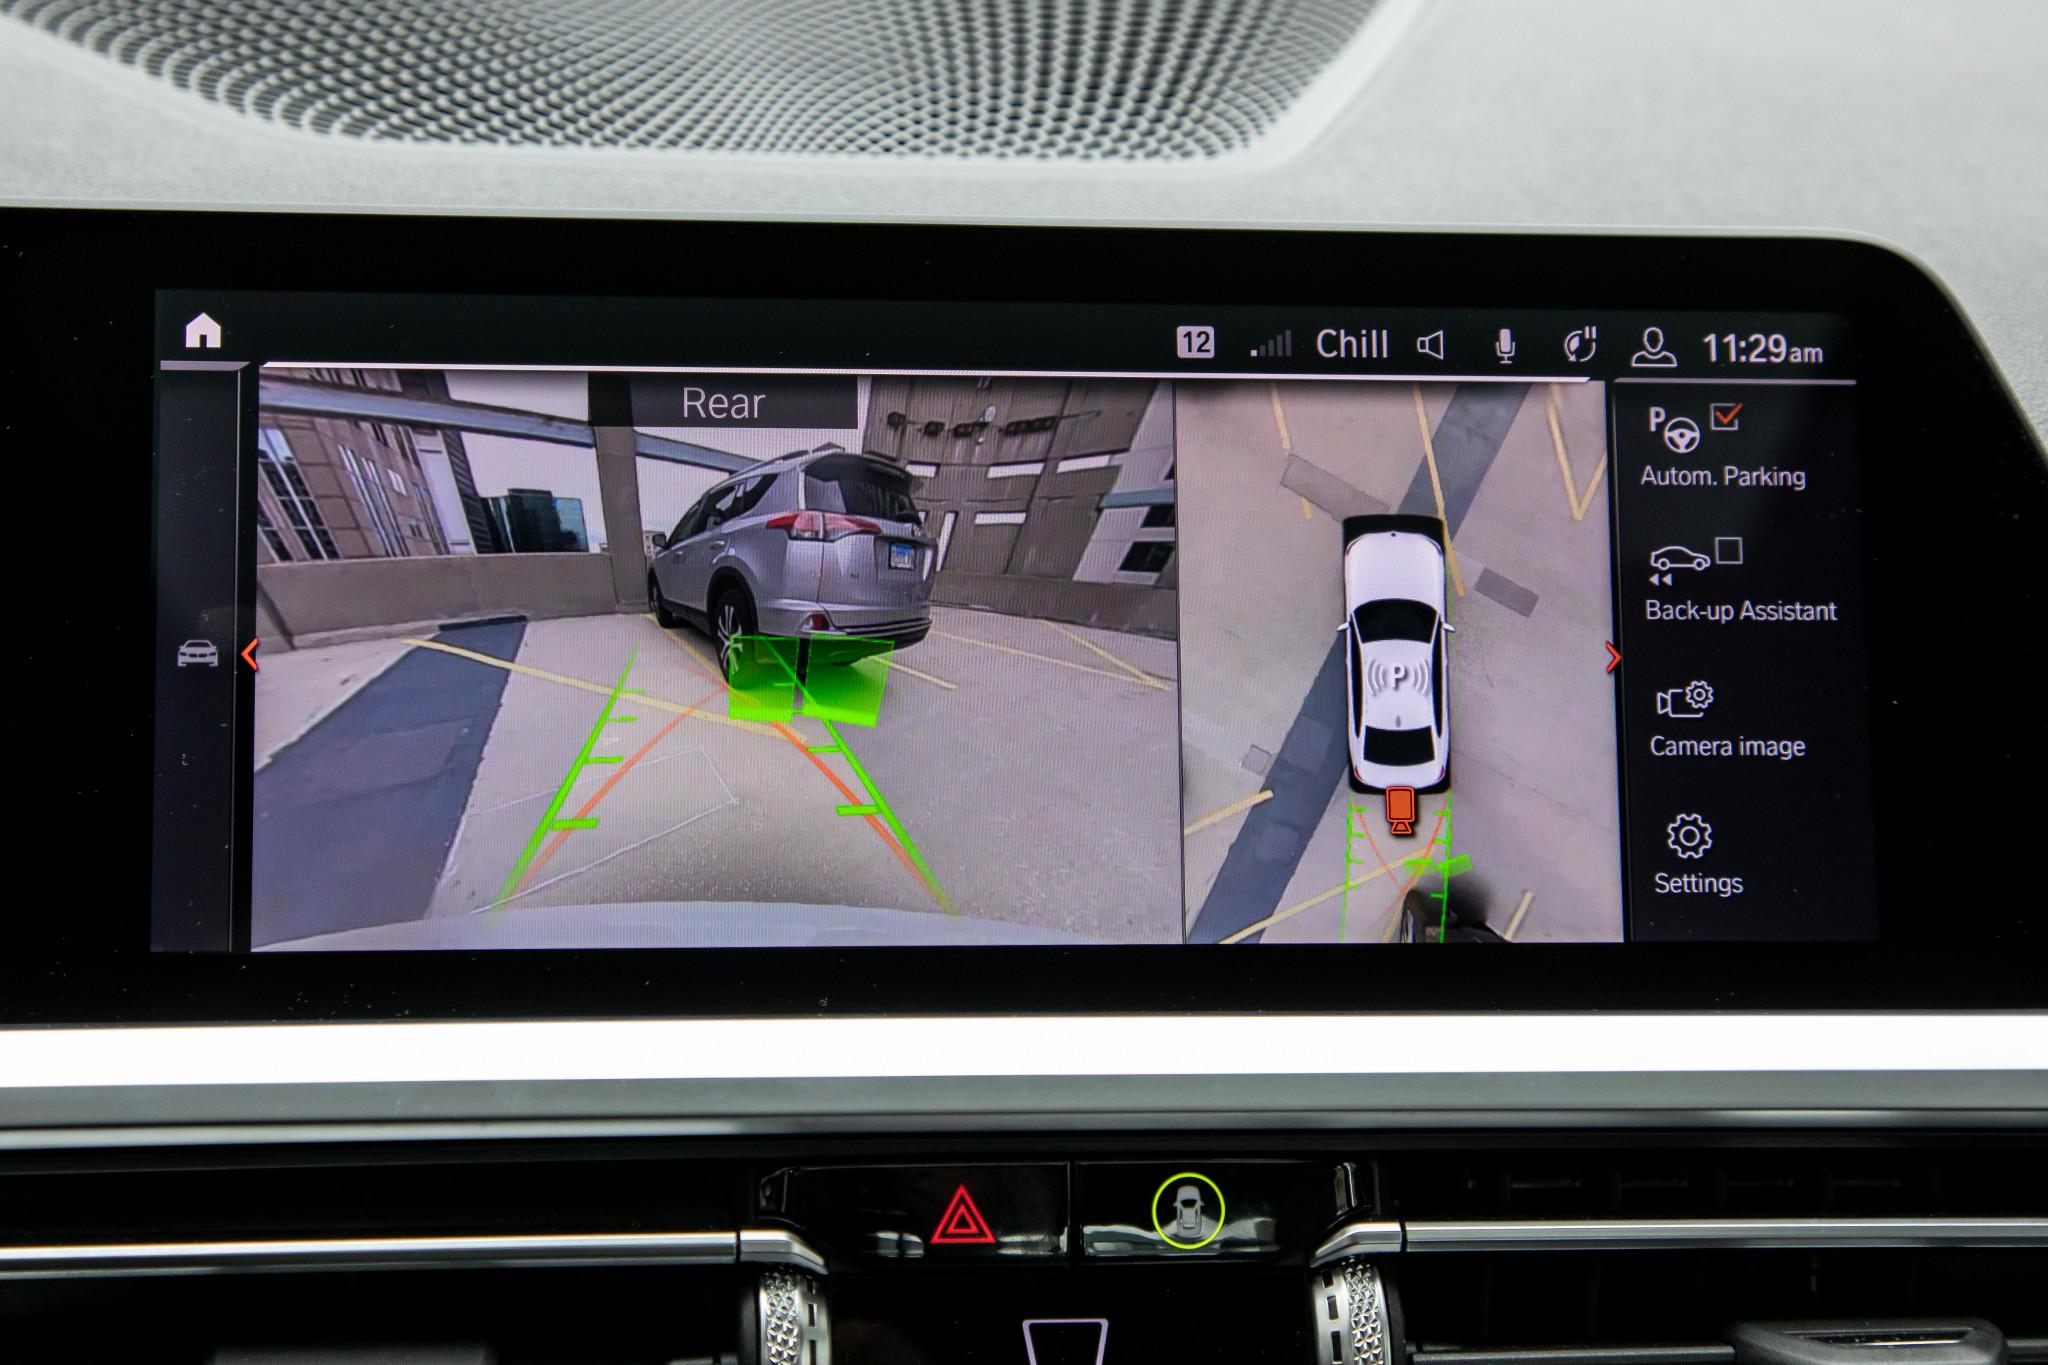 bmw-330i-2019-43-camera--center-stack-display--front-row--interior.jpg